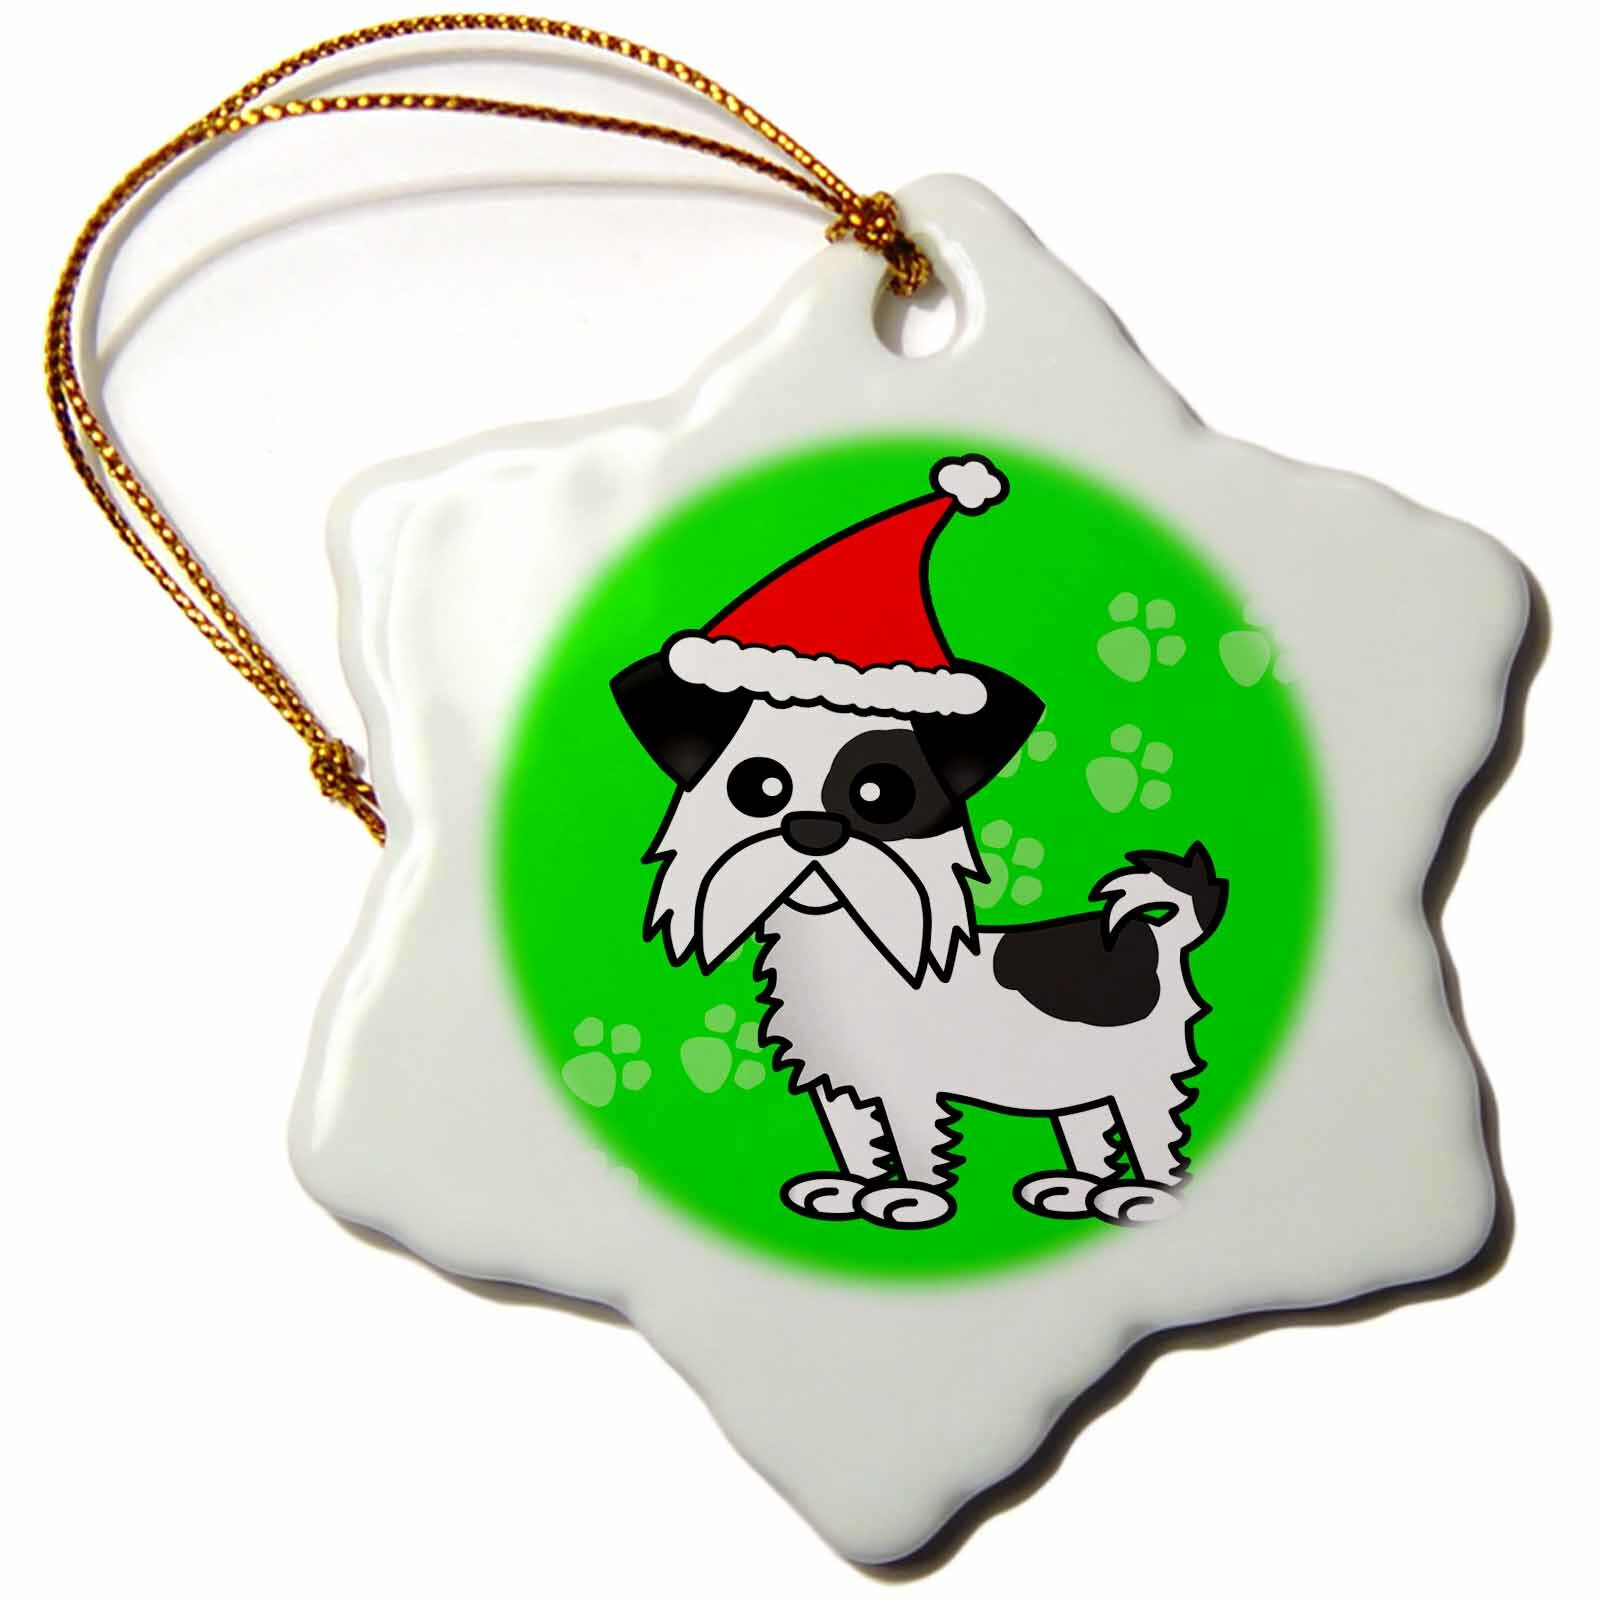 The Holiday Aisle Cute Shih Tzu With Santa Hat Holiday Shaped Ornament Wayfair